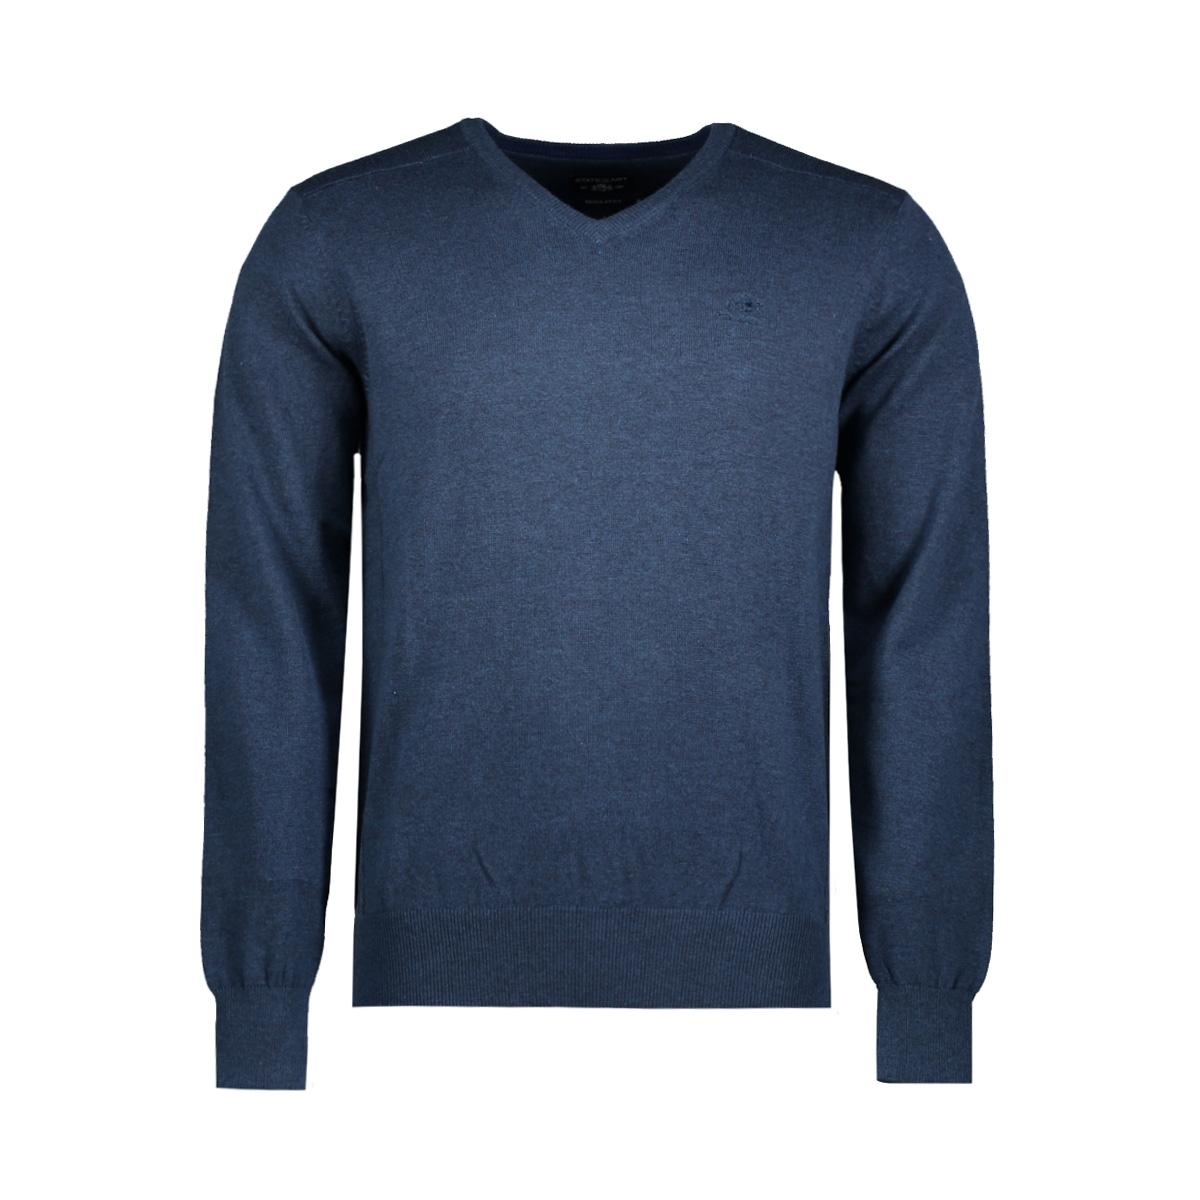 12117333 state of art sweater 5500